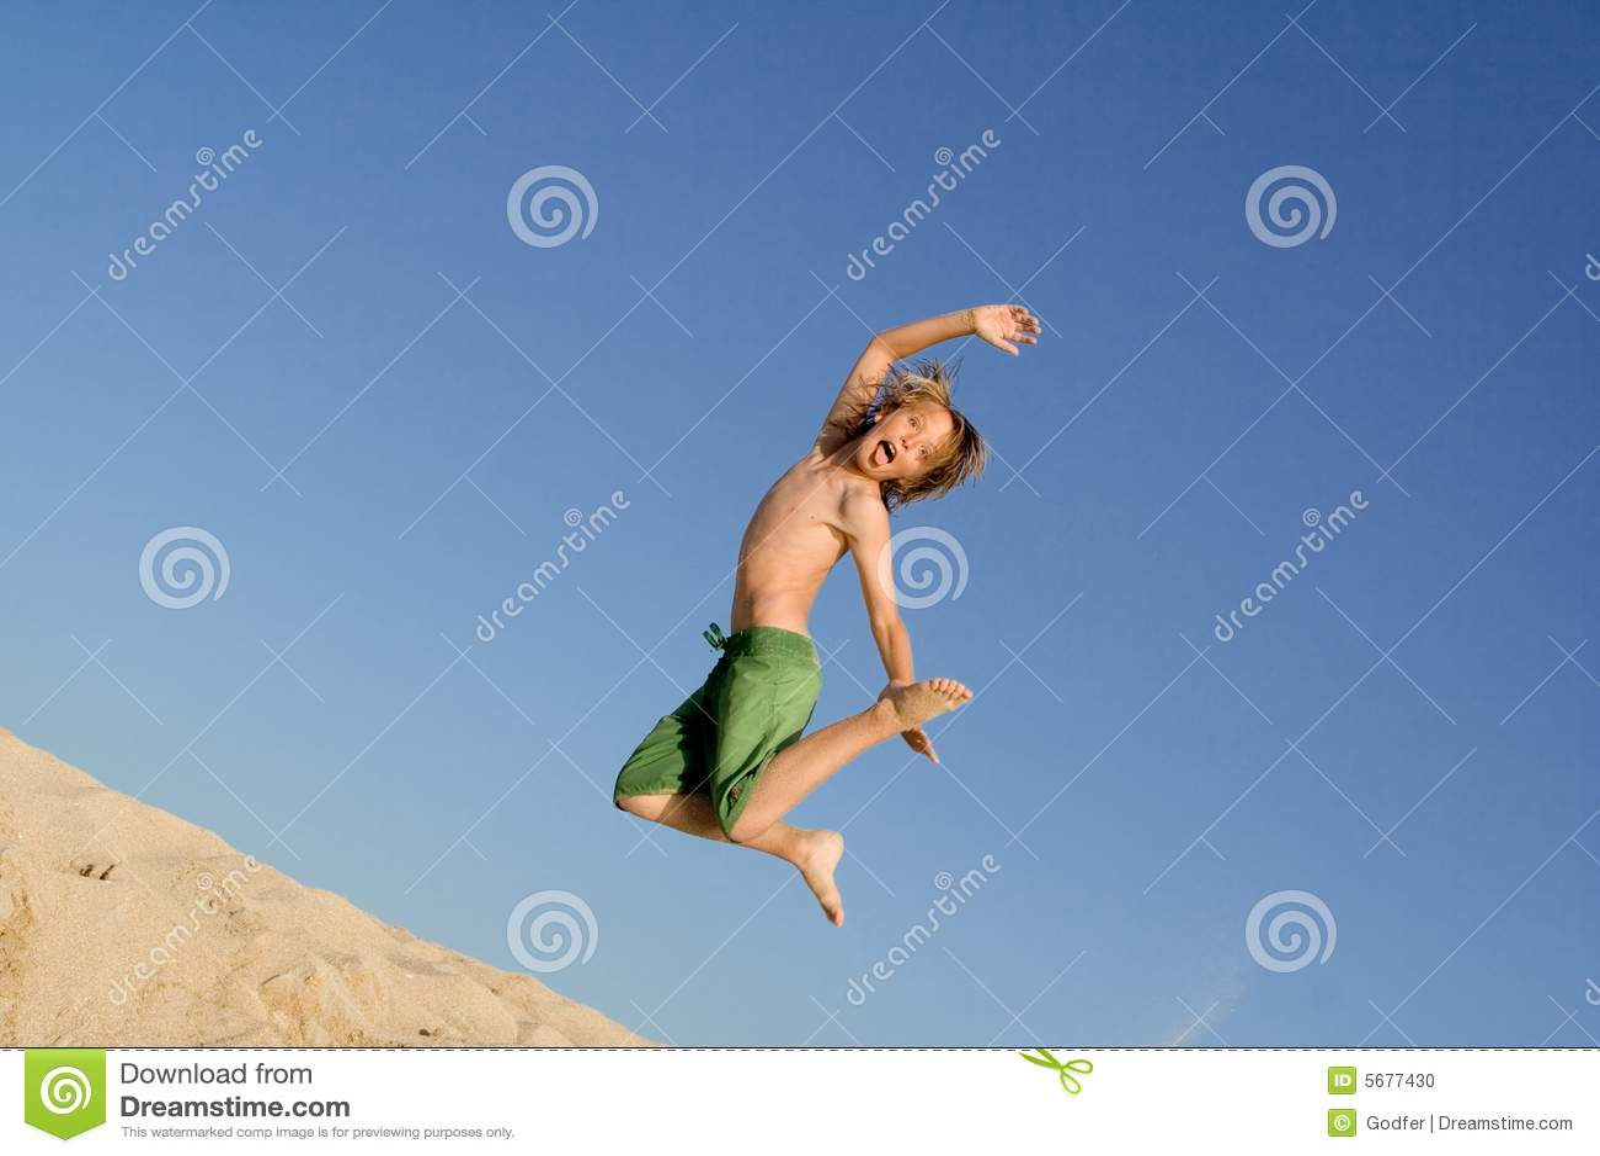 каникула активного ребенка скача